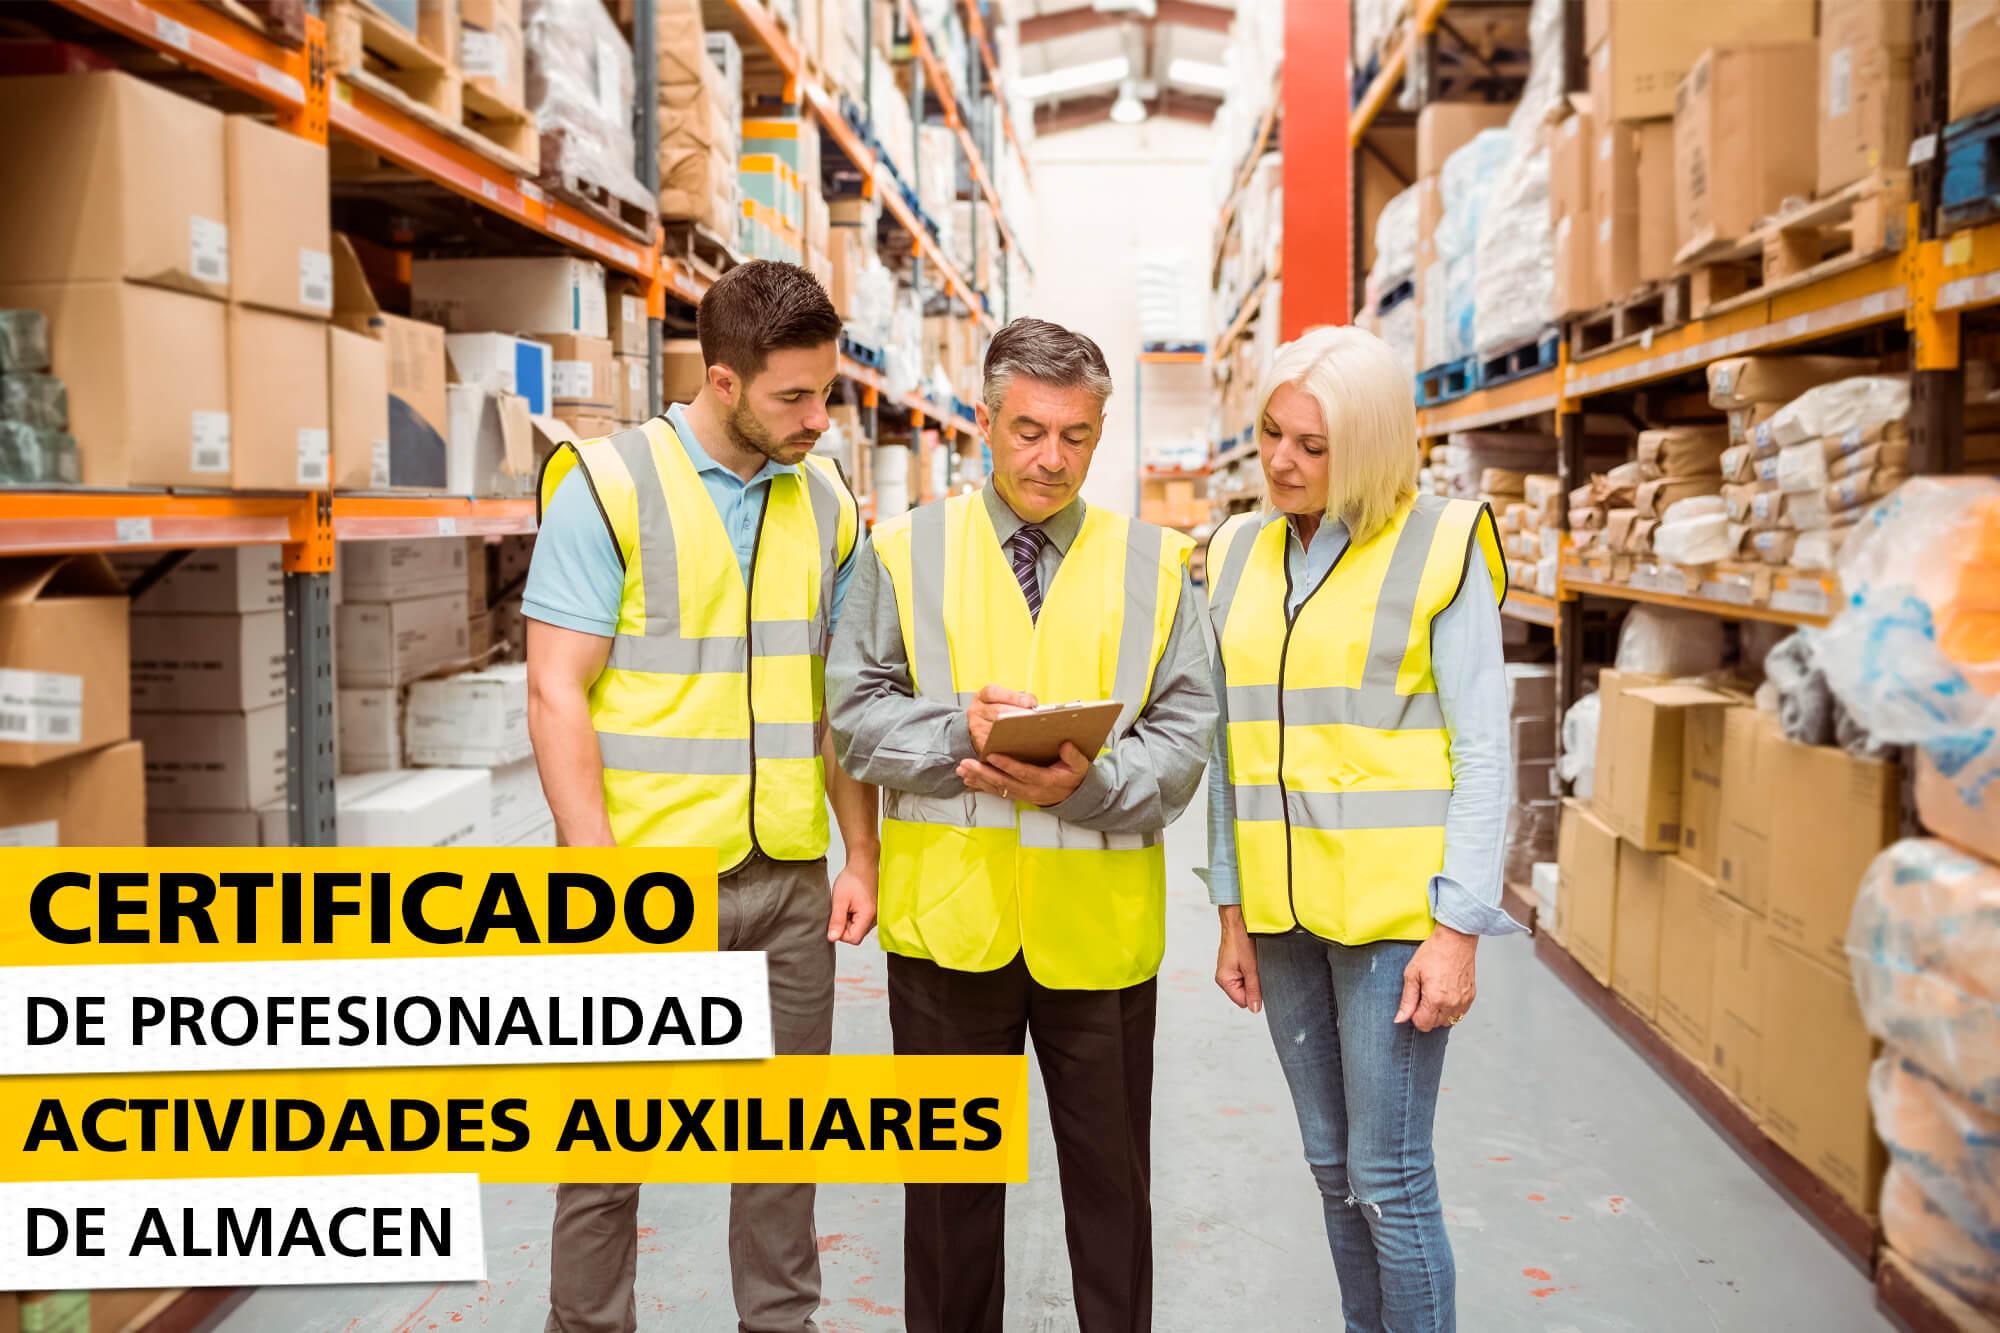 certificado-profesionalidad-actividades-auxiliares-almacen-img-destacada